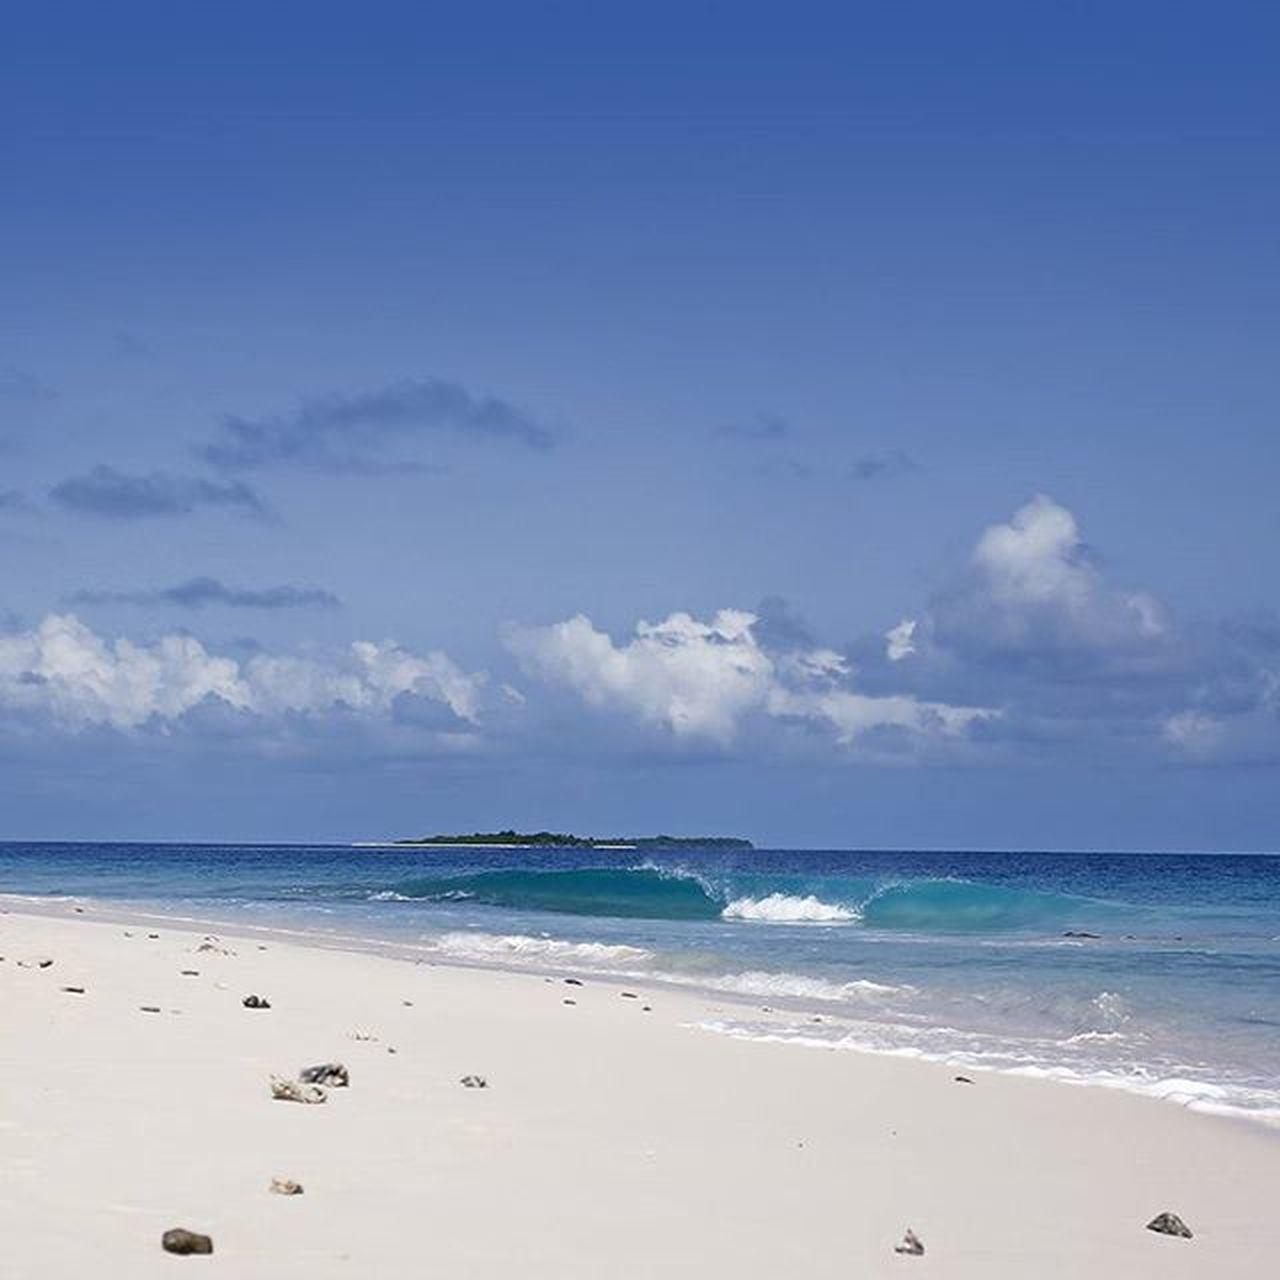 Nature at its best. ━━━━━━━━━━━━━━━━━━ Maldives Luxuryworldtraveler LuxwtPrime Zitahli Travel Lifestyle Holiday HotelsandResorts Bestvacations Vacation Instatravel Travelgram Nature Tasteintravel BeachZone Wave Photooftheday Landscape Travelbreak мальдивы 马尔代夫 Malediven  Maldive 몰디브 Мальдив Maldivas المالديف • • • • • •